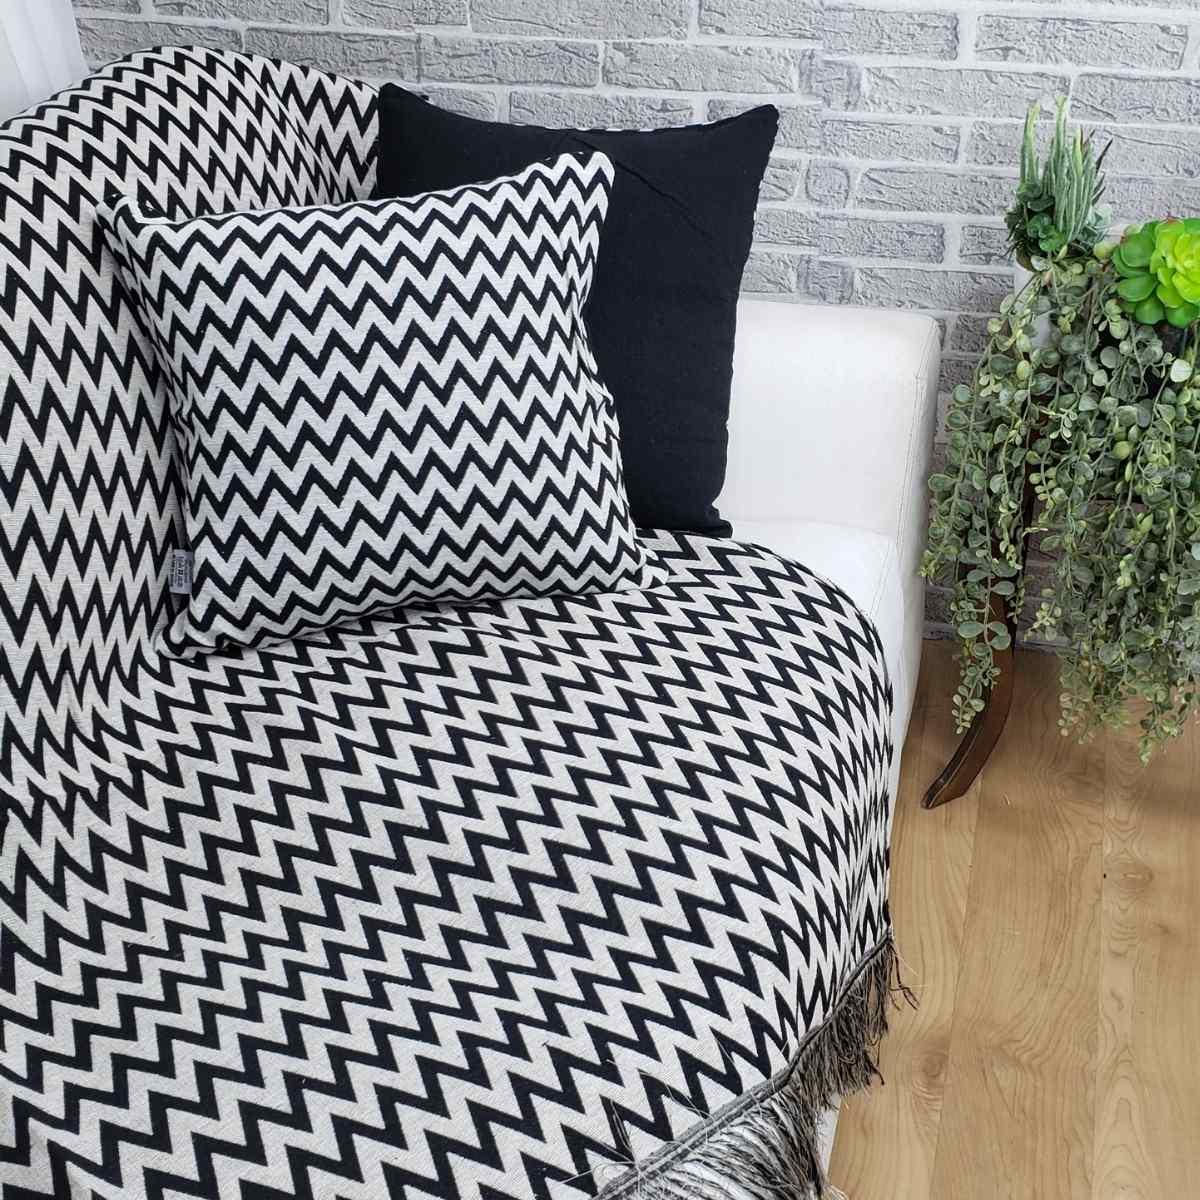 Manta sofa jacquard 140x200 DES 147